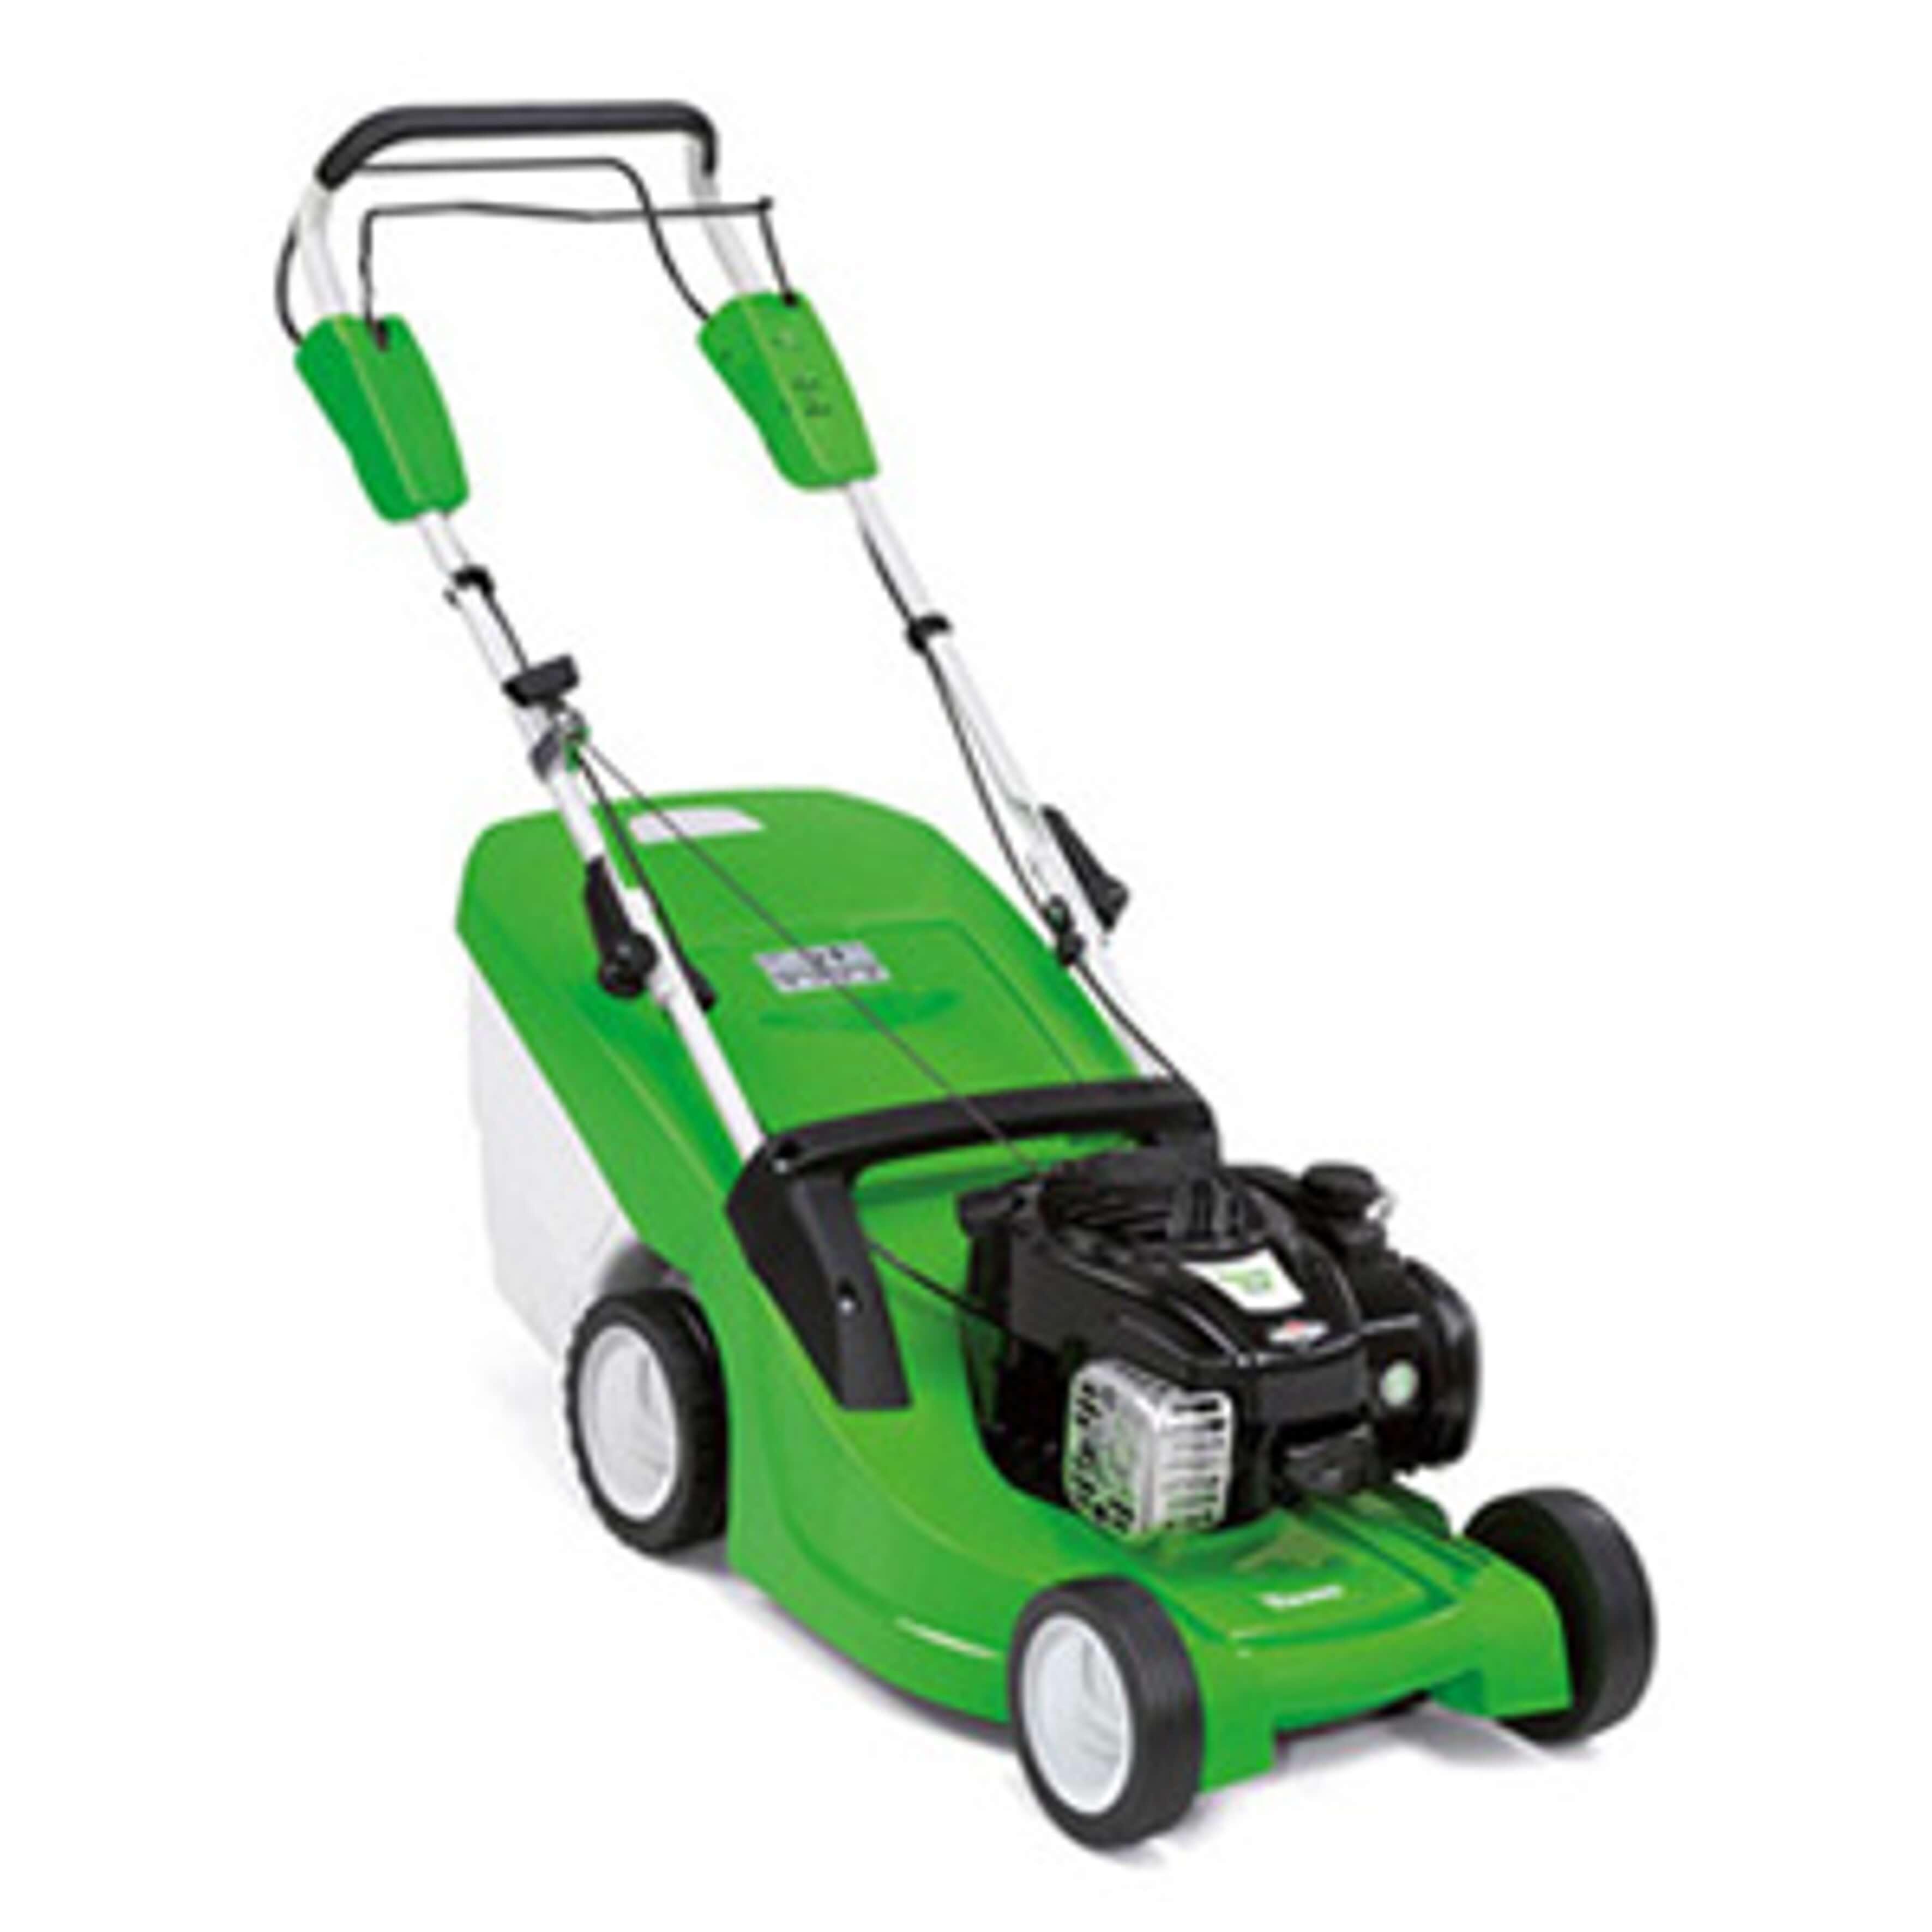 Viking MB 443.0 X Petrol Lawn Mowers